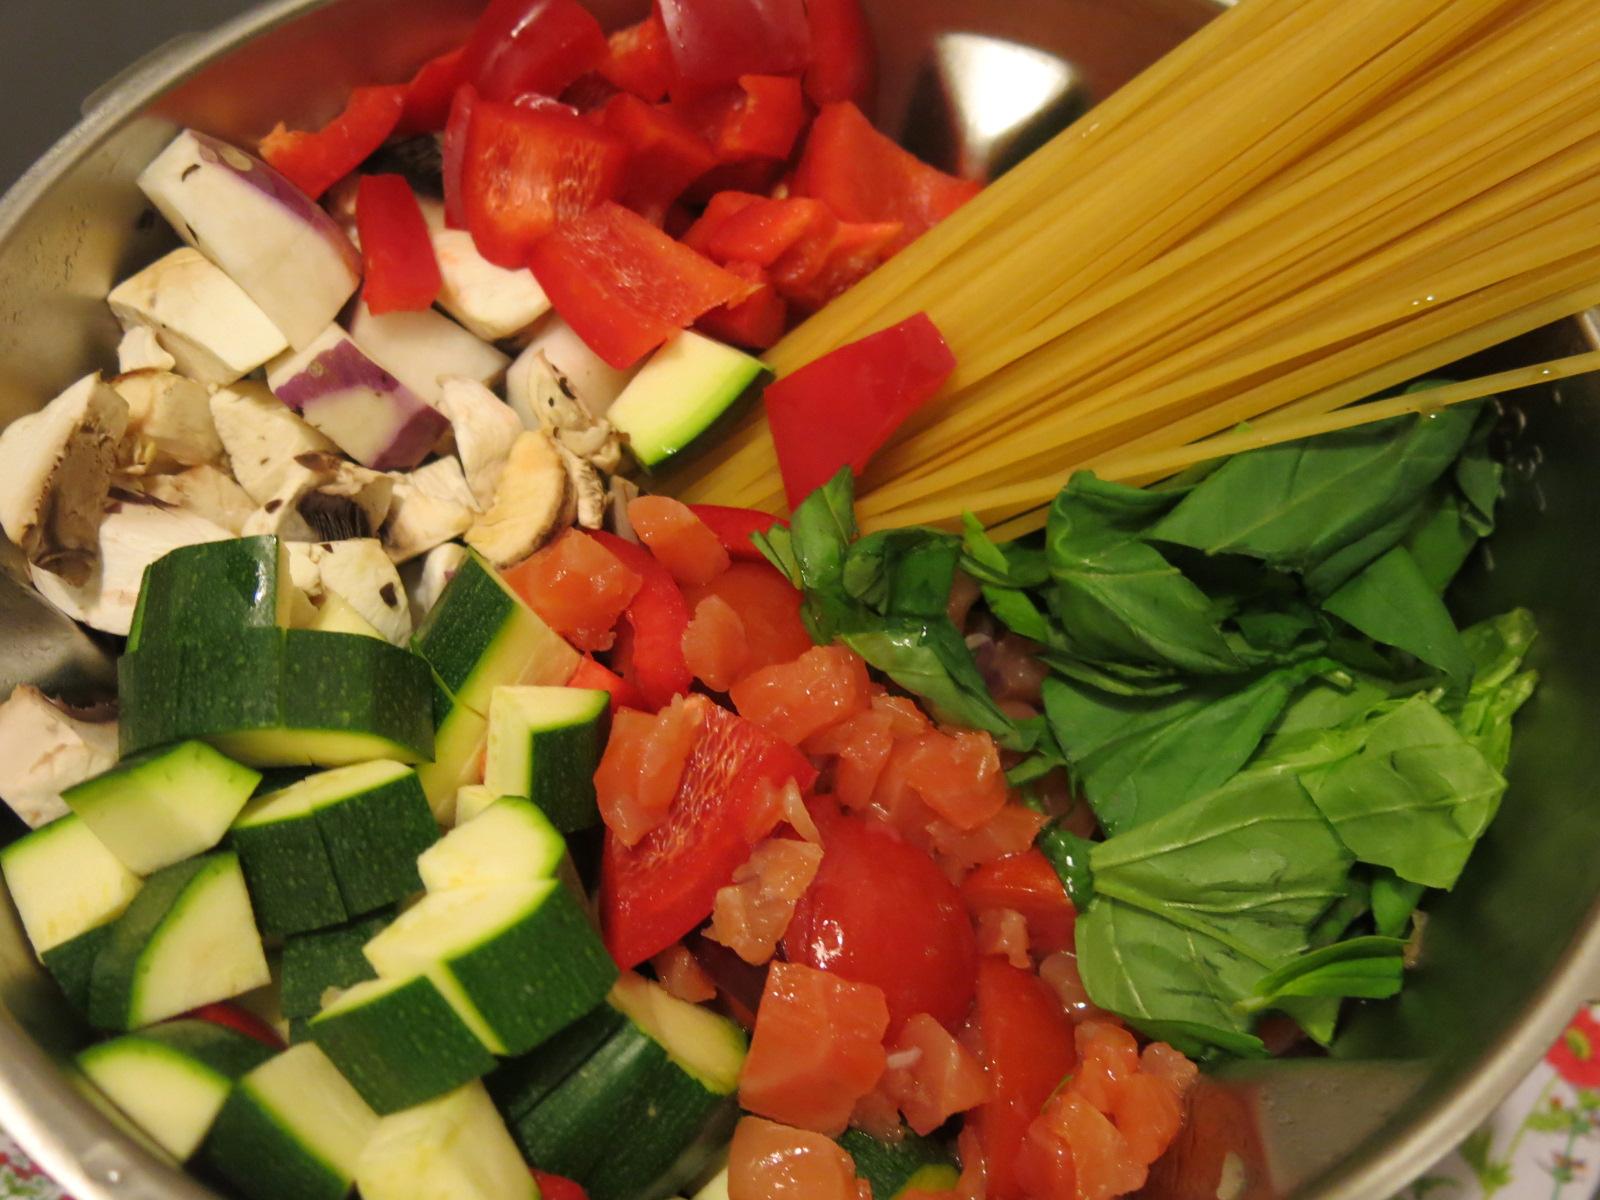 One pot pasta : LA solution du feignant gourmand !